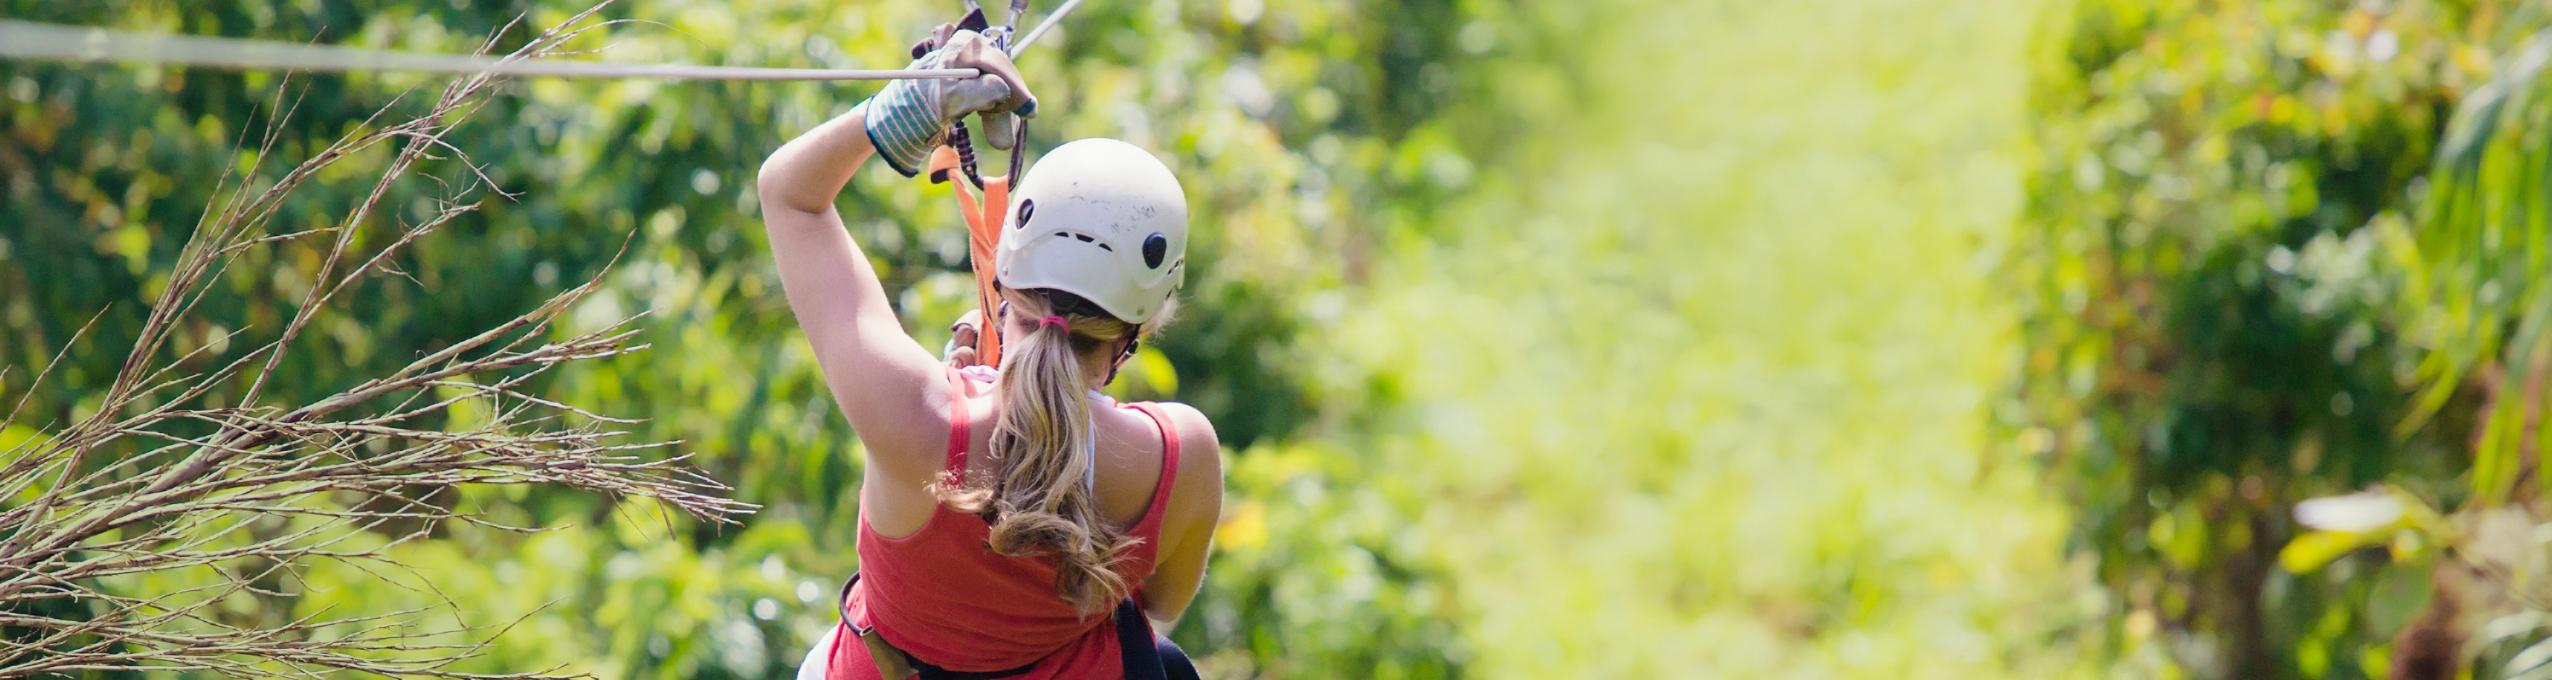 Woman ziplining.